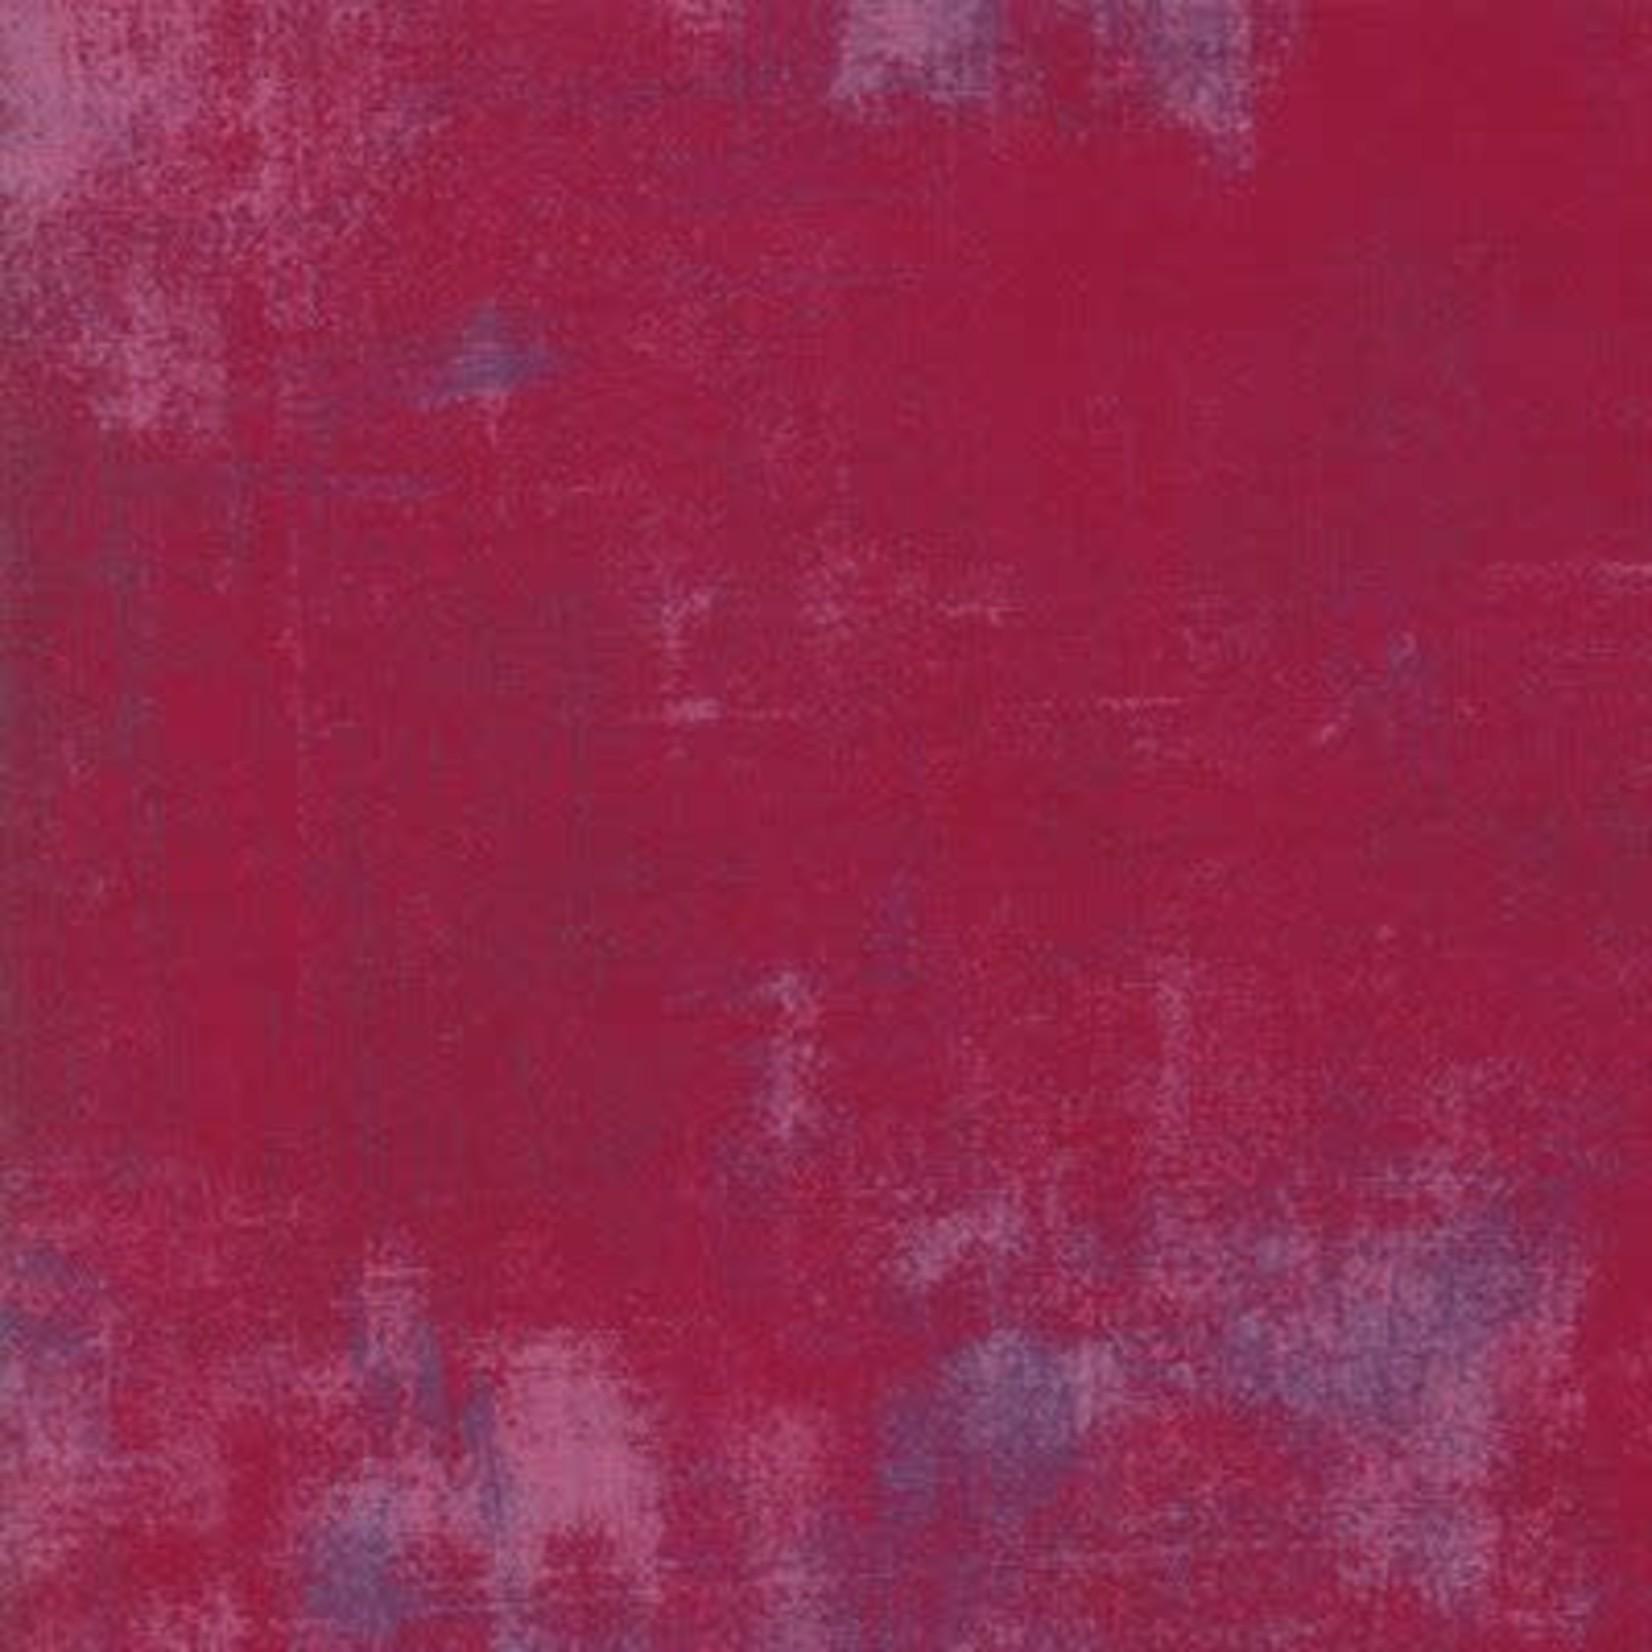 Moda Grunge Basics Grunge - Cordavan per cm or $20/m